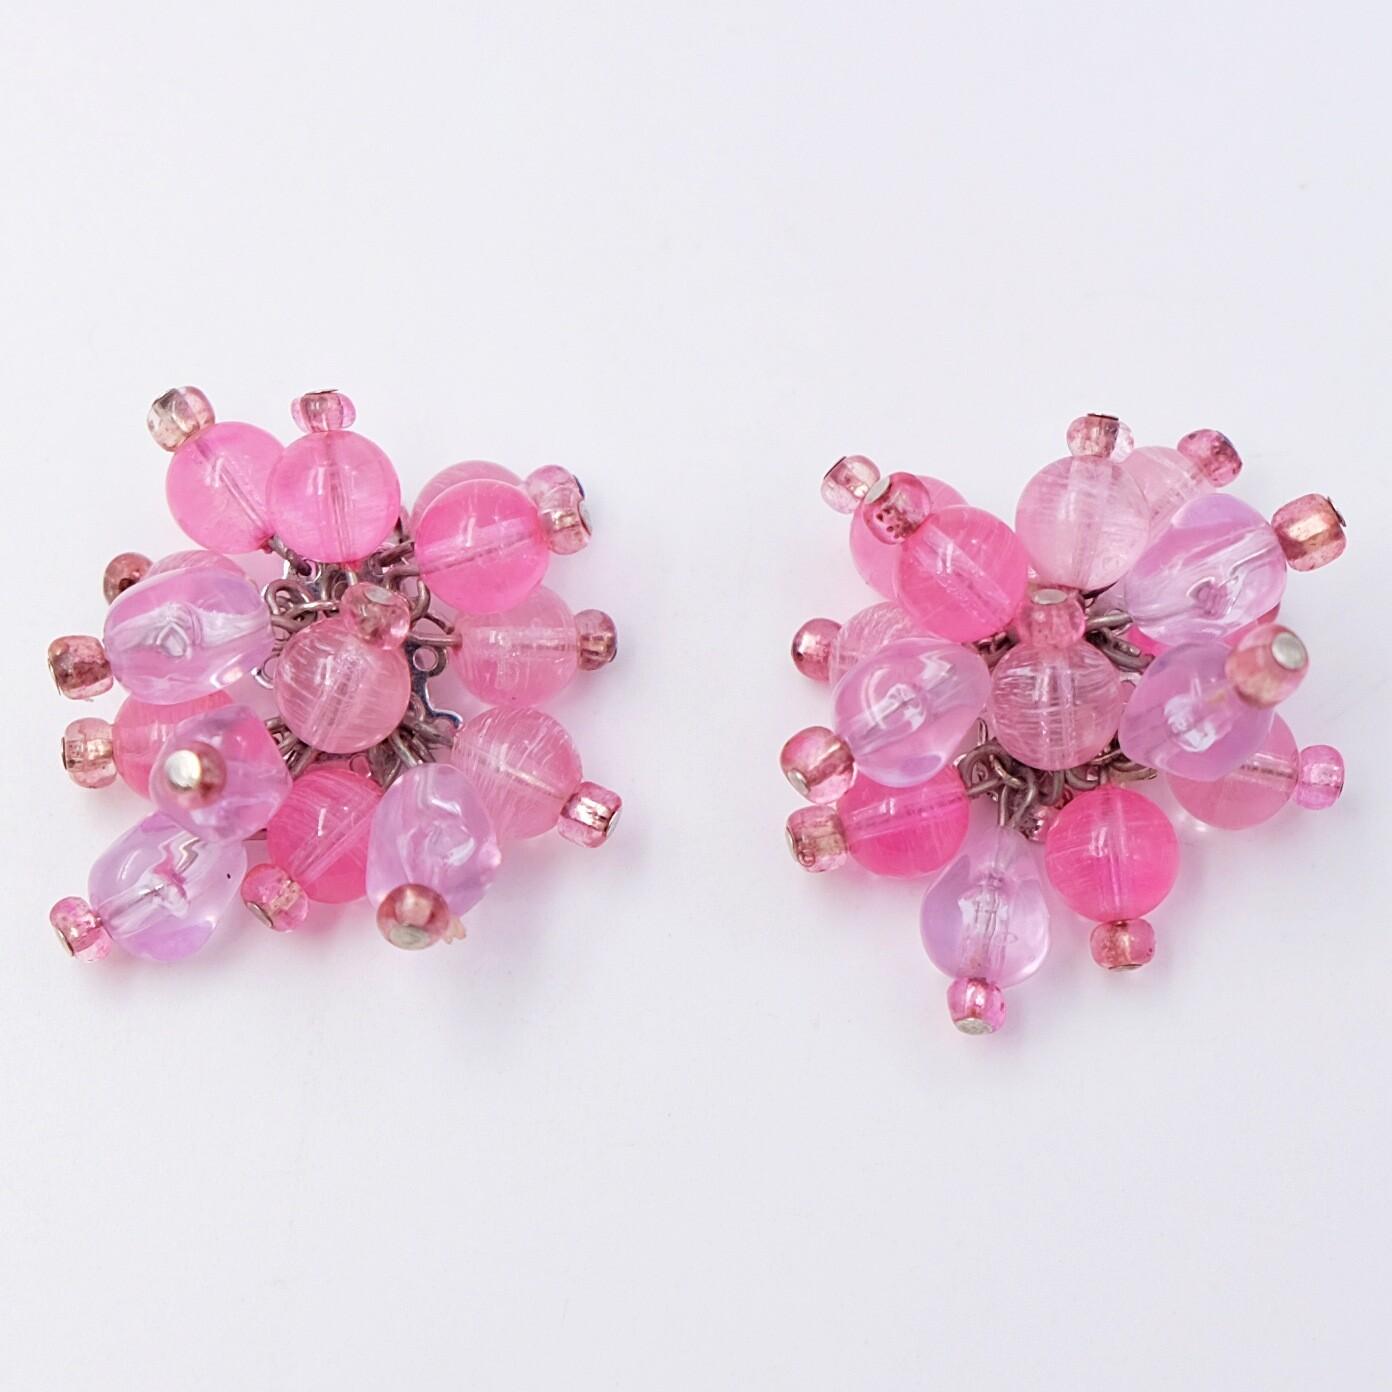 Vintage Glass Marvella Earrings 1960s